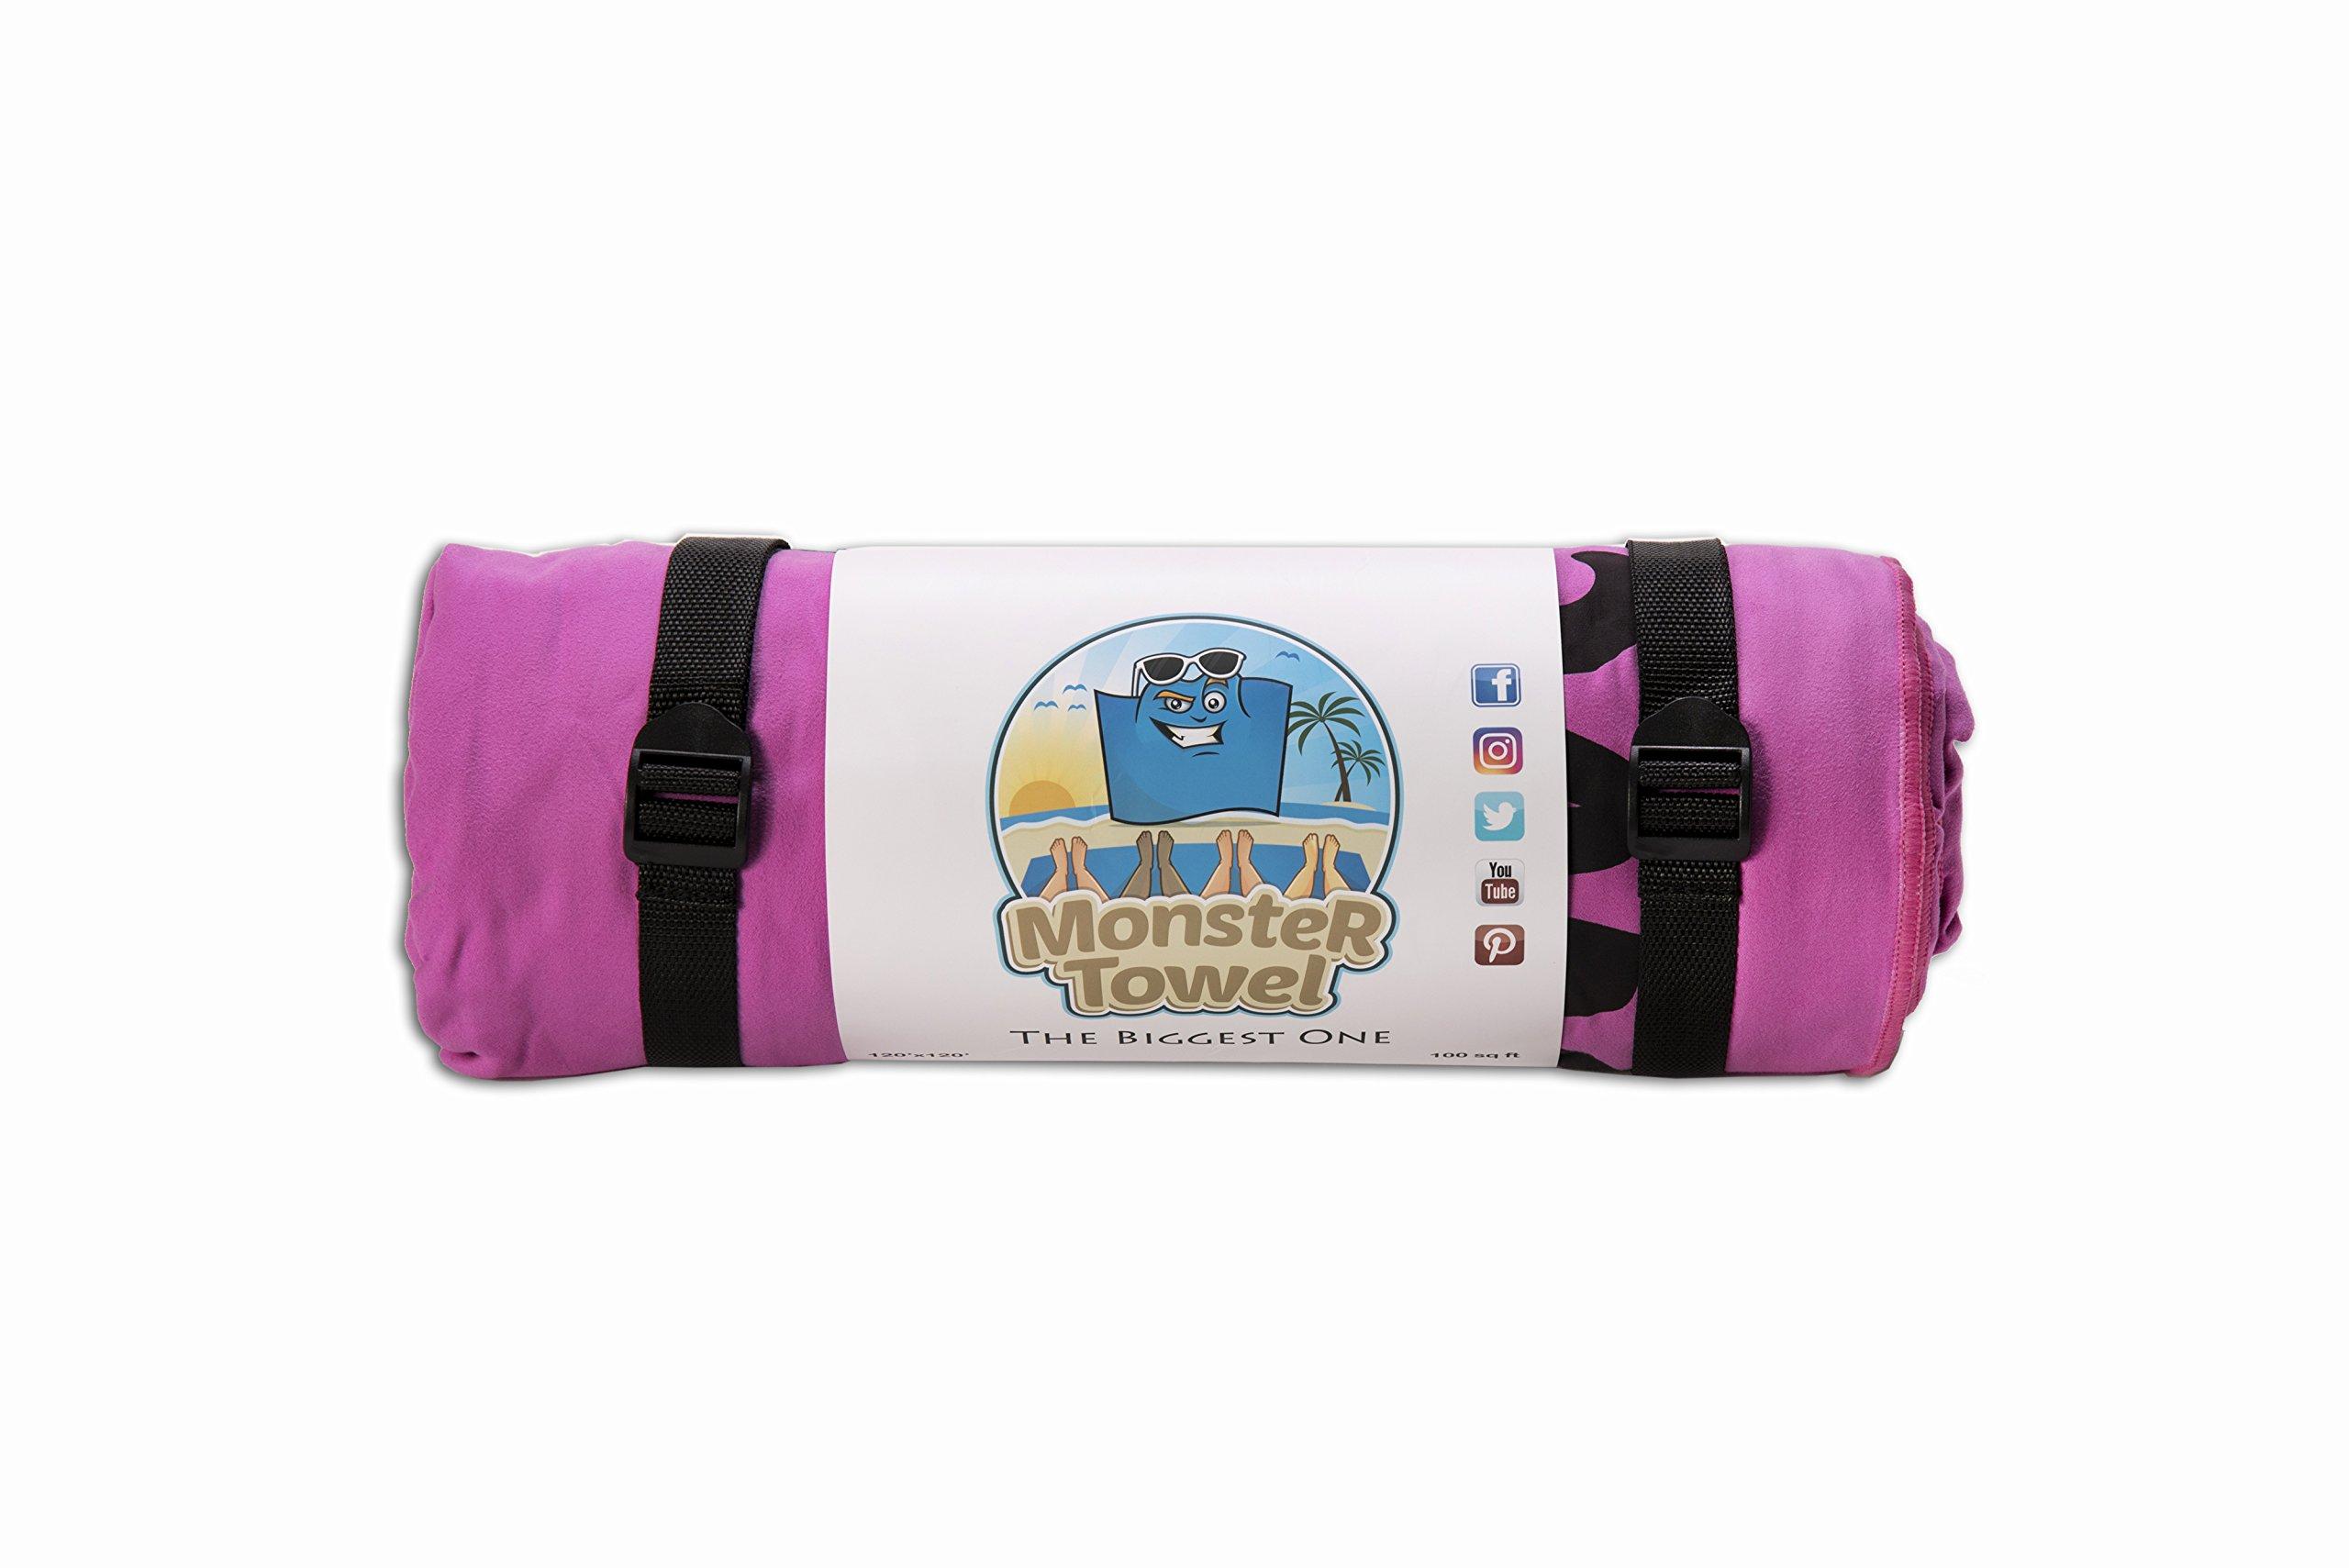 Monster Towel The Worlds Biggest Towel. Big Beach Towel Microfiber Oversized Large Huge Beach Towel(Sunrise Pink)